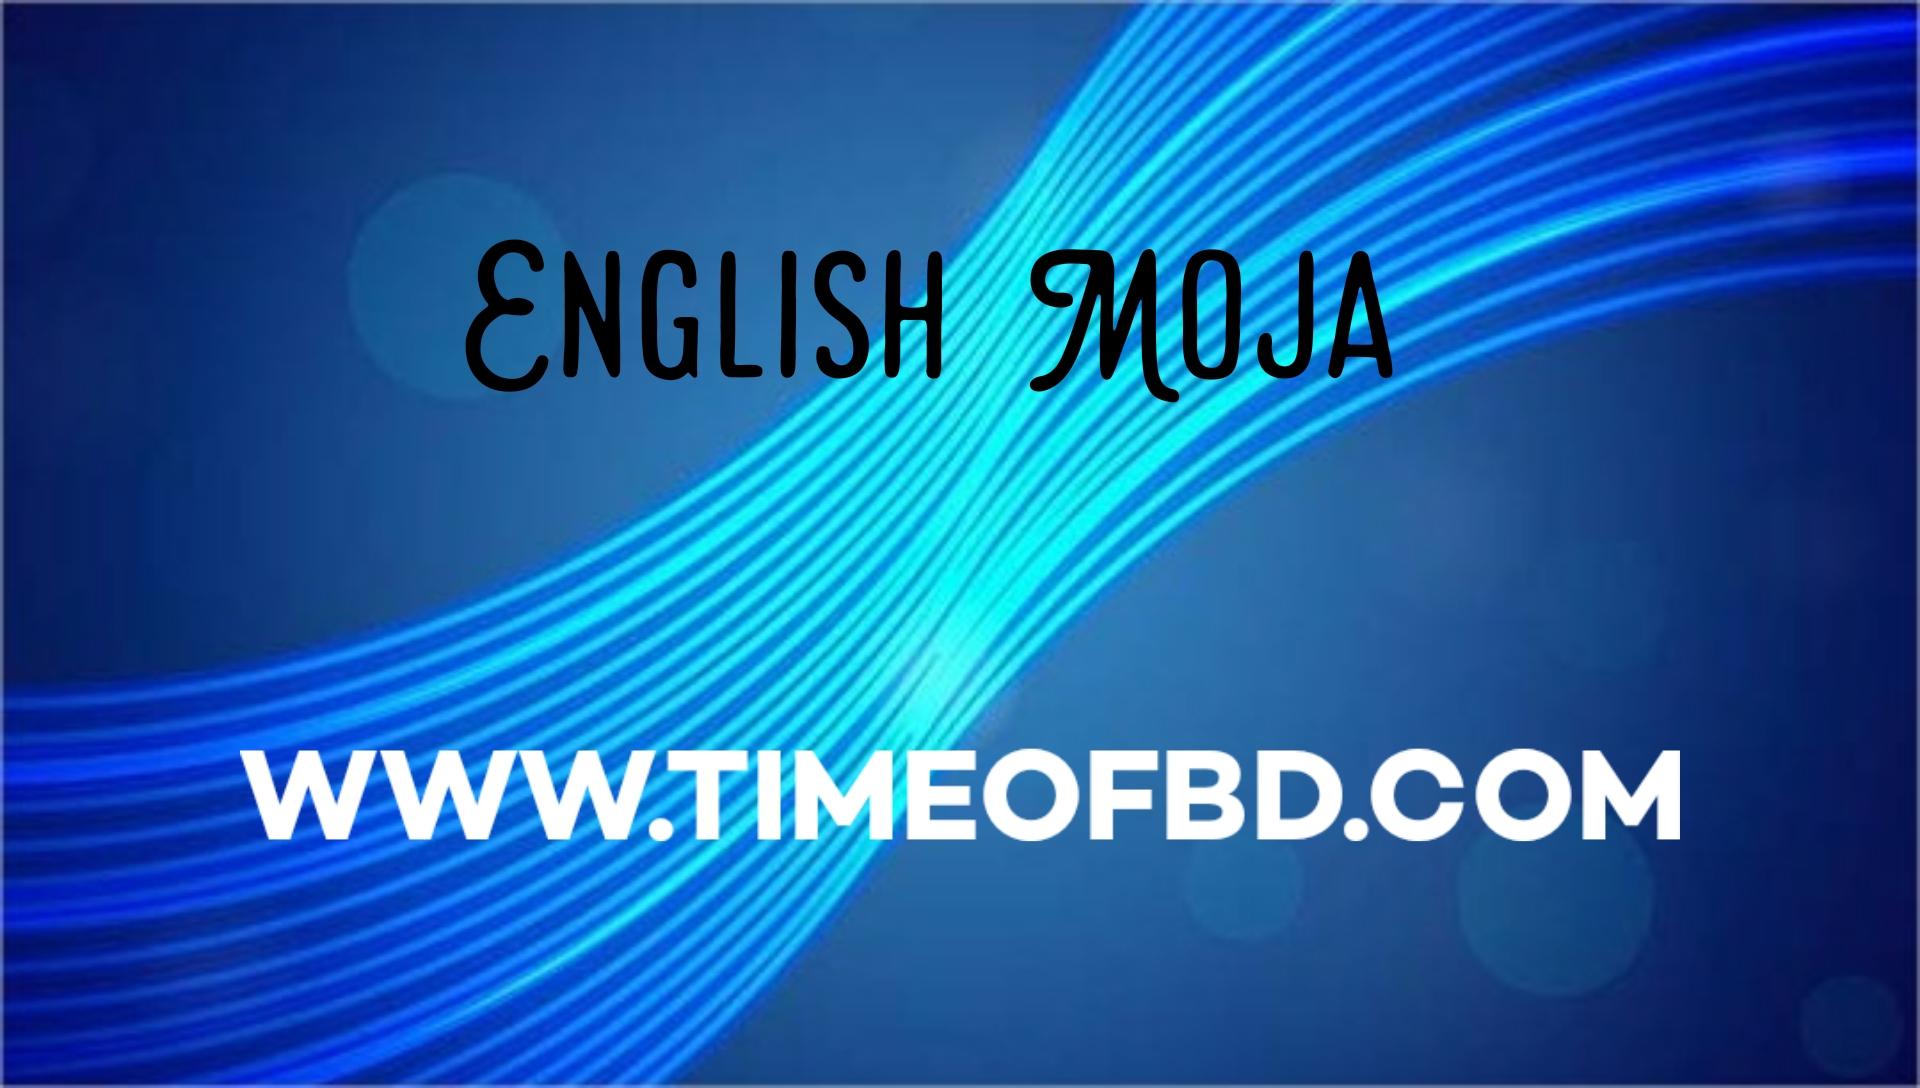 English Moja। ইংলিশ মজা